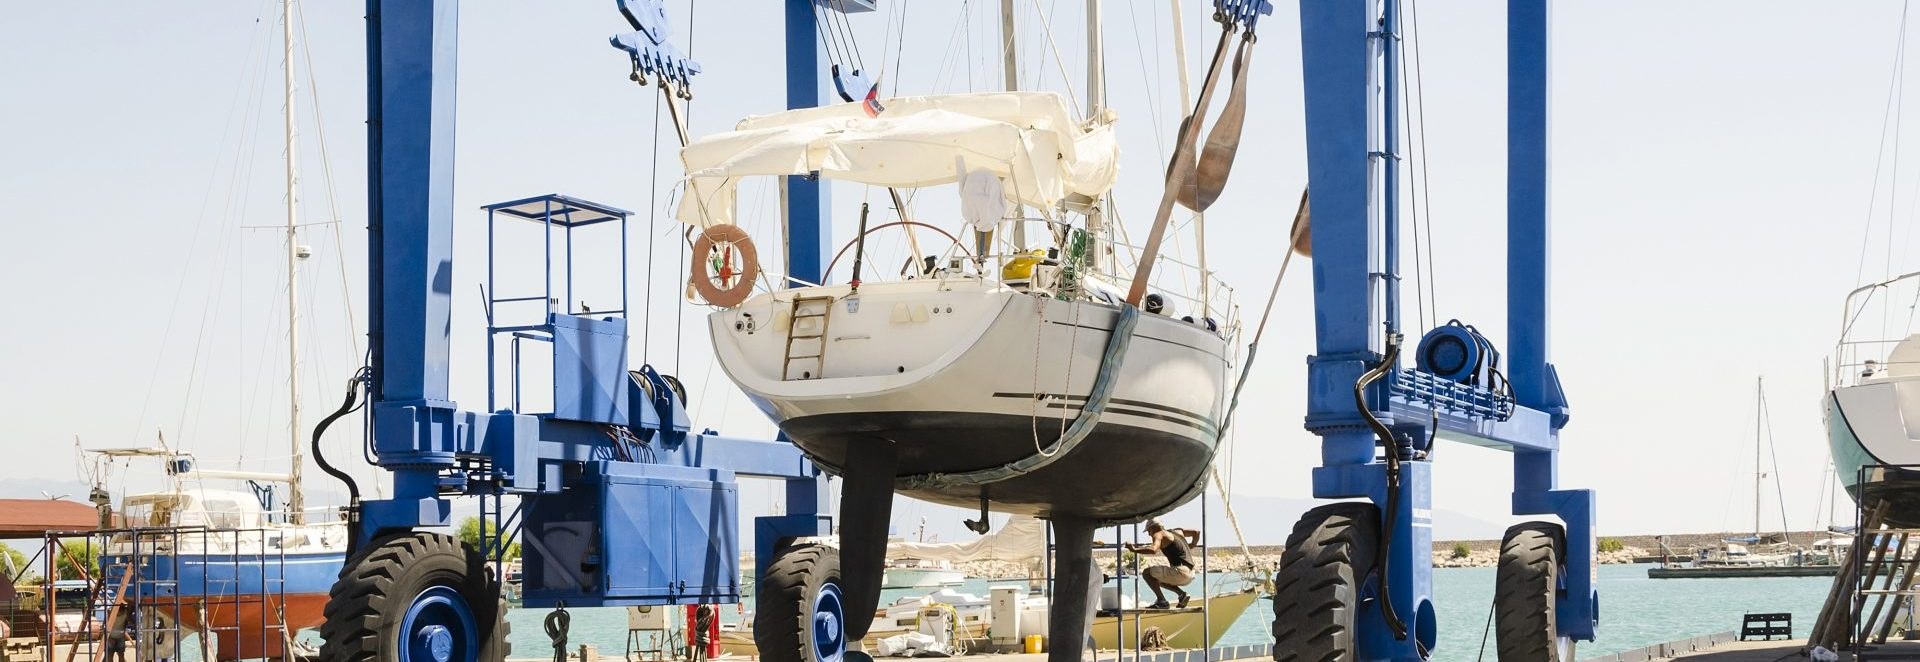 sailboat lift launching for season